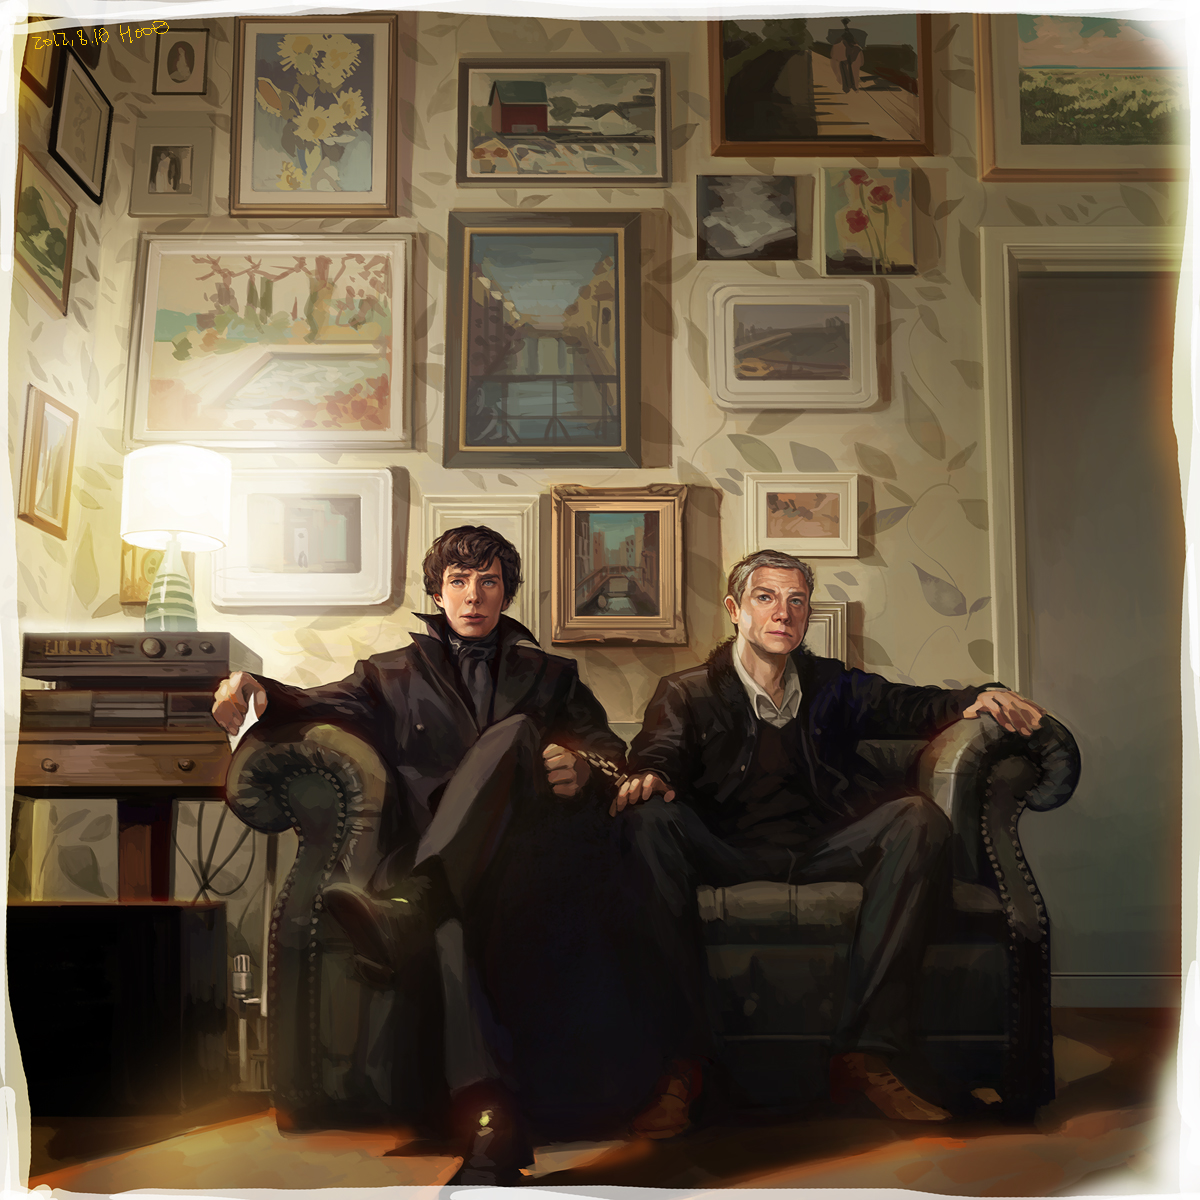 Sherlock and John by hoo0